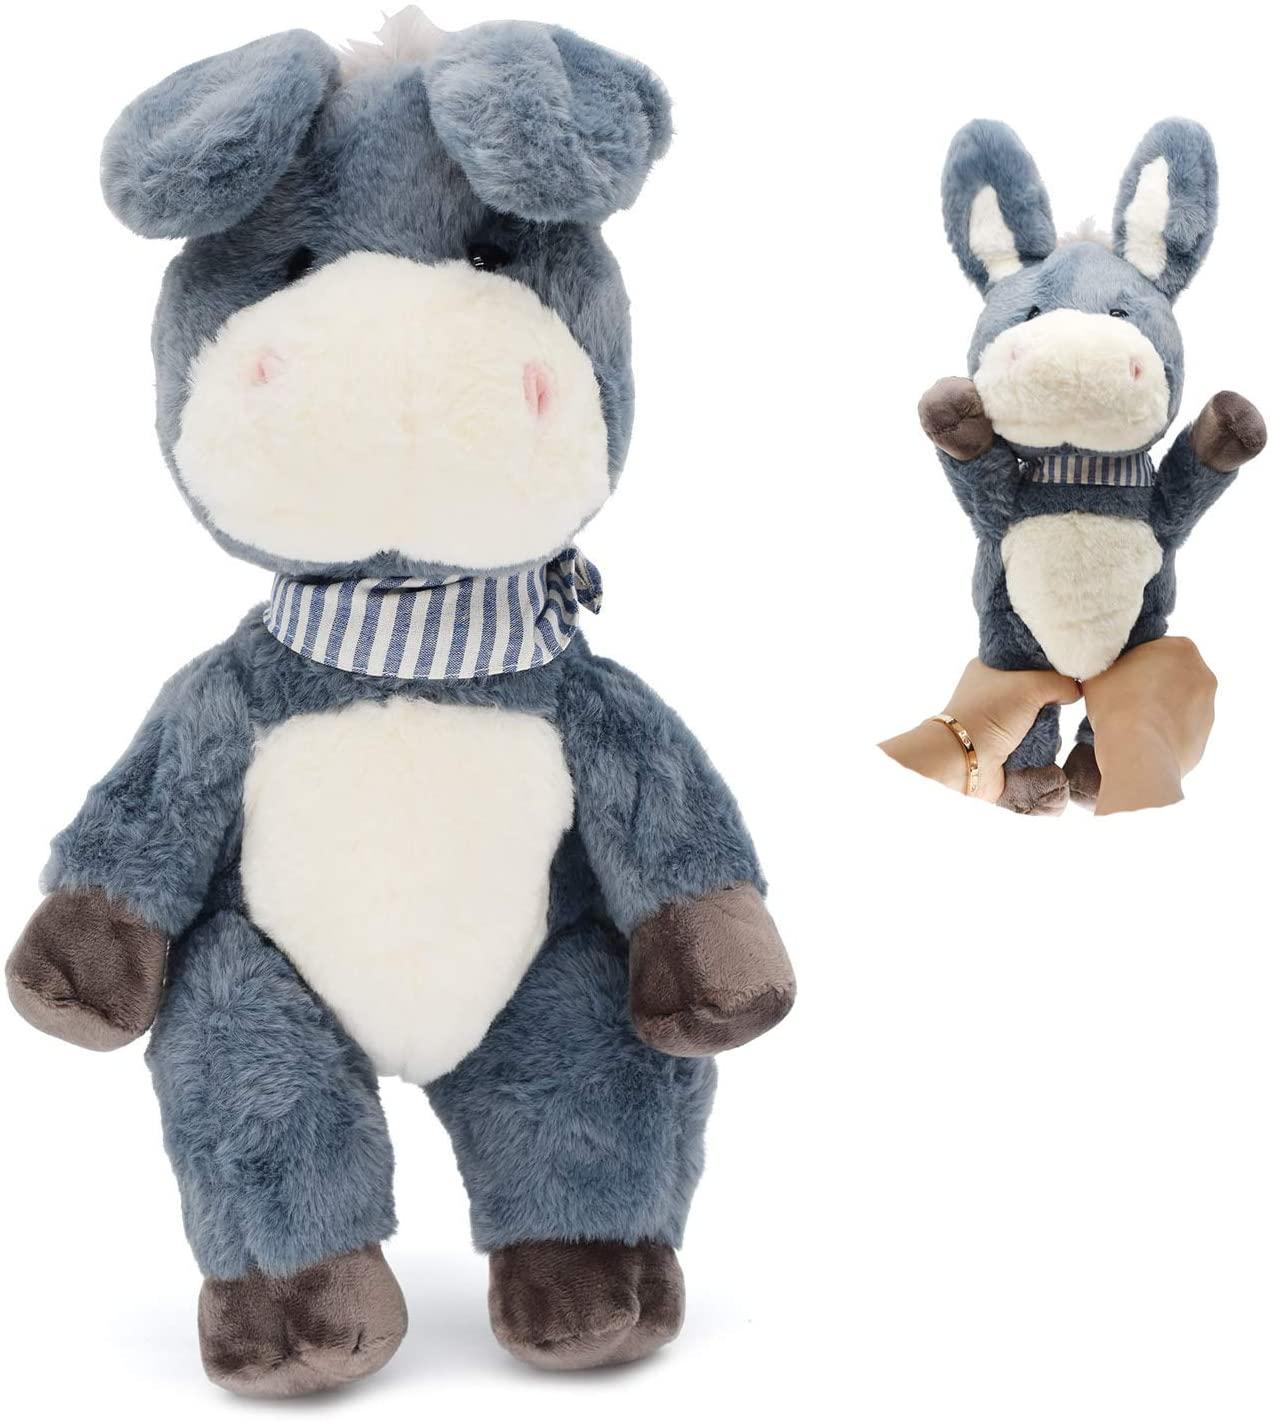 Soft Gasbag Plush Donkey Toys, 16 Stuffed Animals Dolls for Kids , Toddlers (Grey)